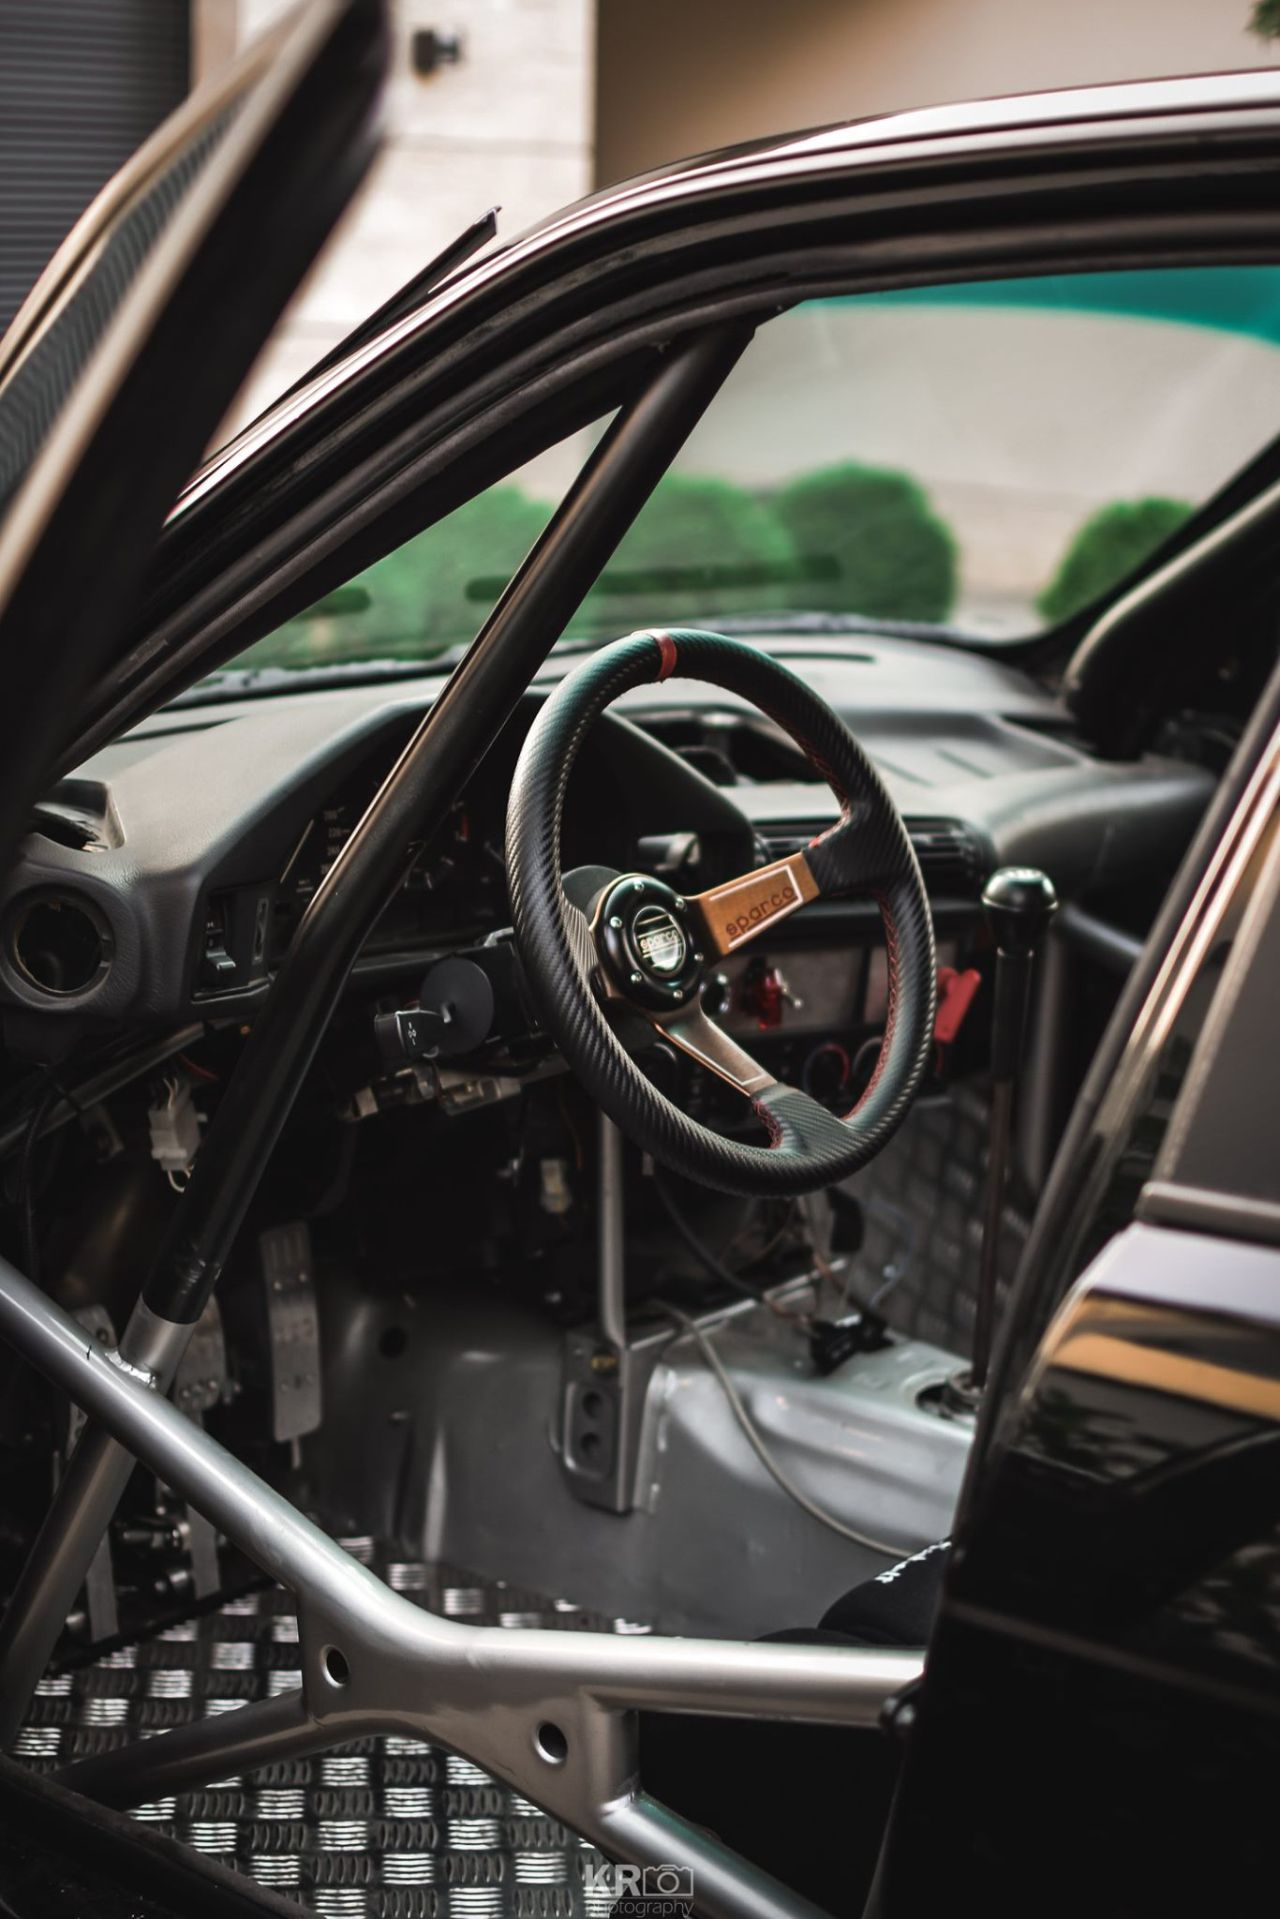 '94 BMW 540i E34 - En 6 en ligne compressé so British ! 30